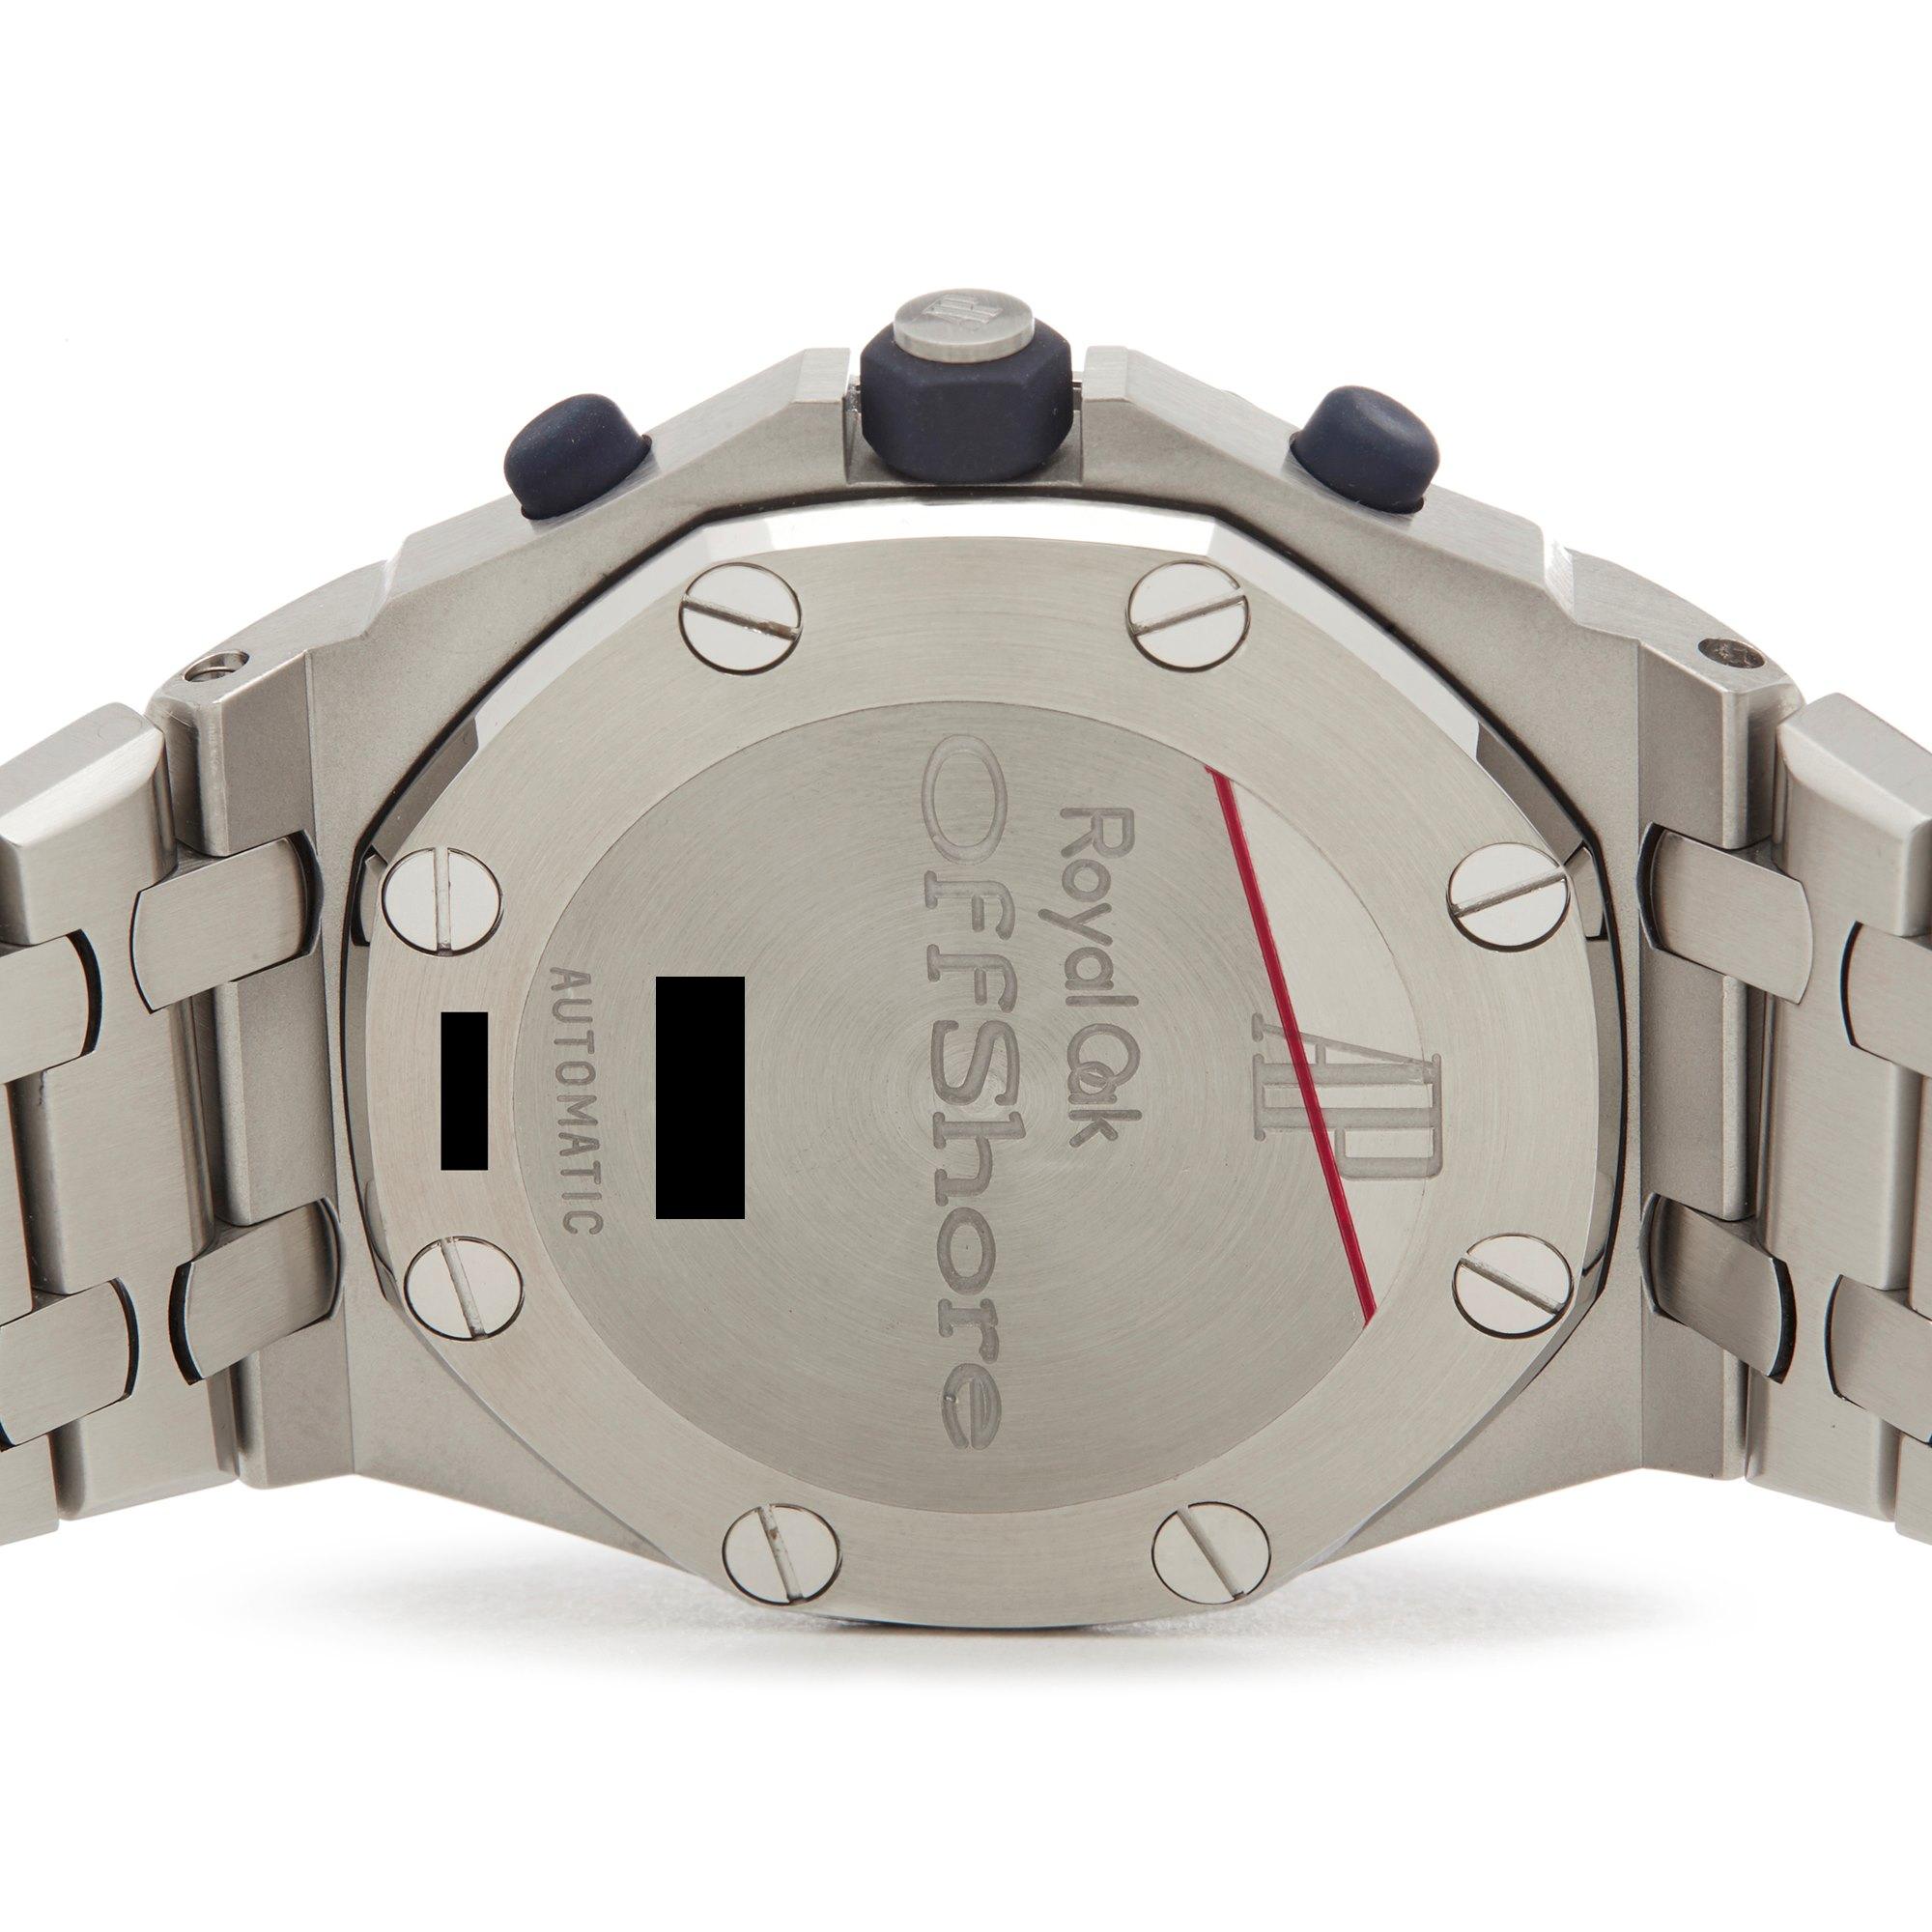 Audemars Piguet Royal Oak Offshore The Beast Chronograph Stainless Steel 25721ST/O/1000ST/01